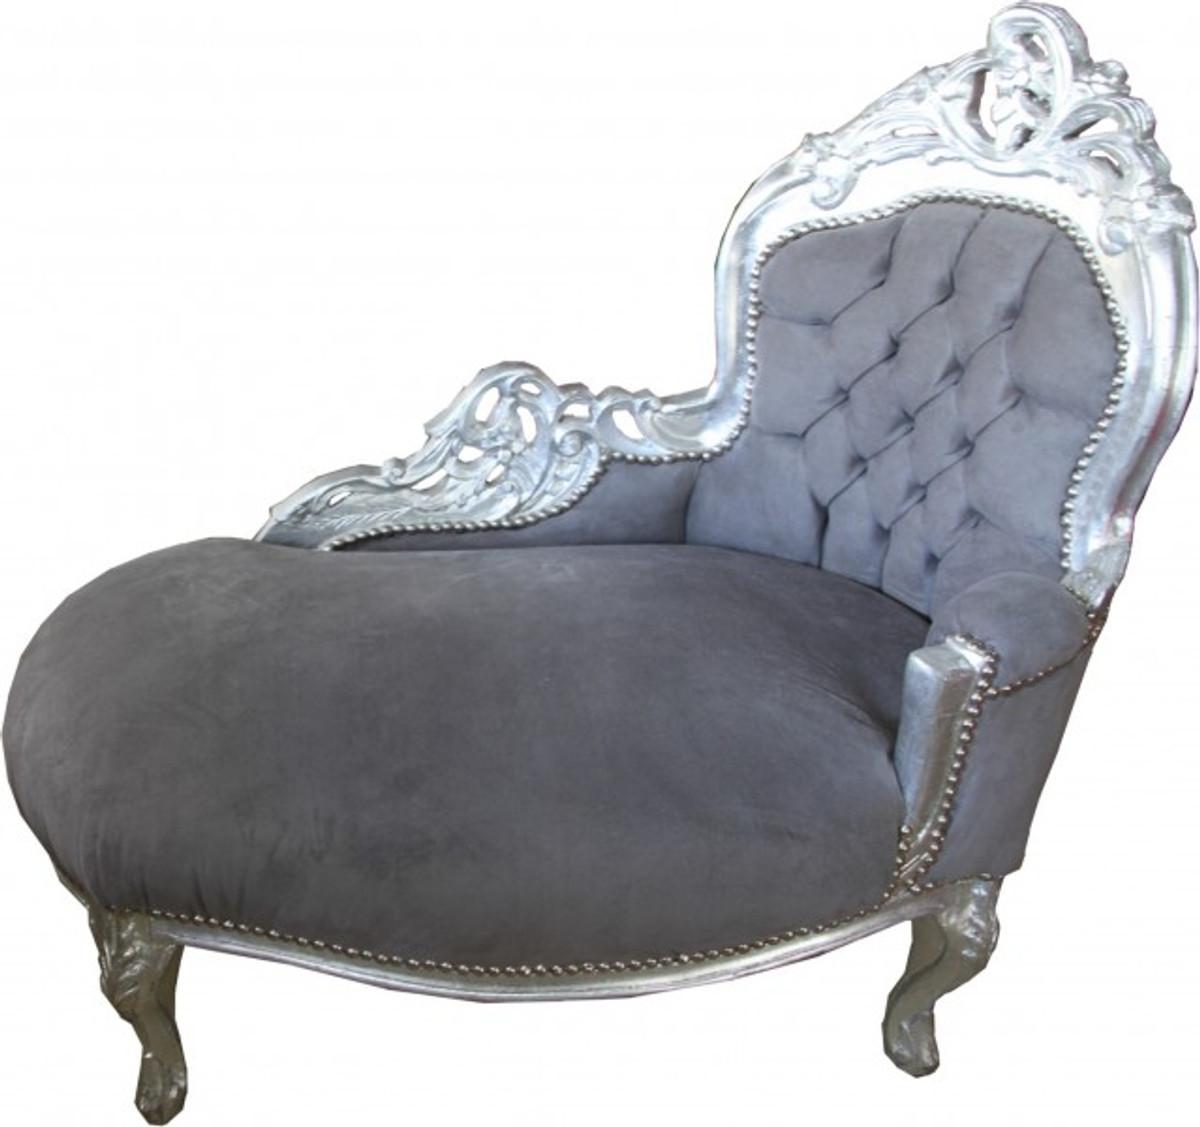 - Casa Padrino Baroque Kids Chaise Lounge Grey / Silver - Baroque